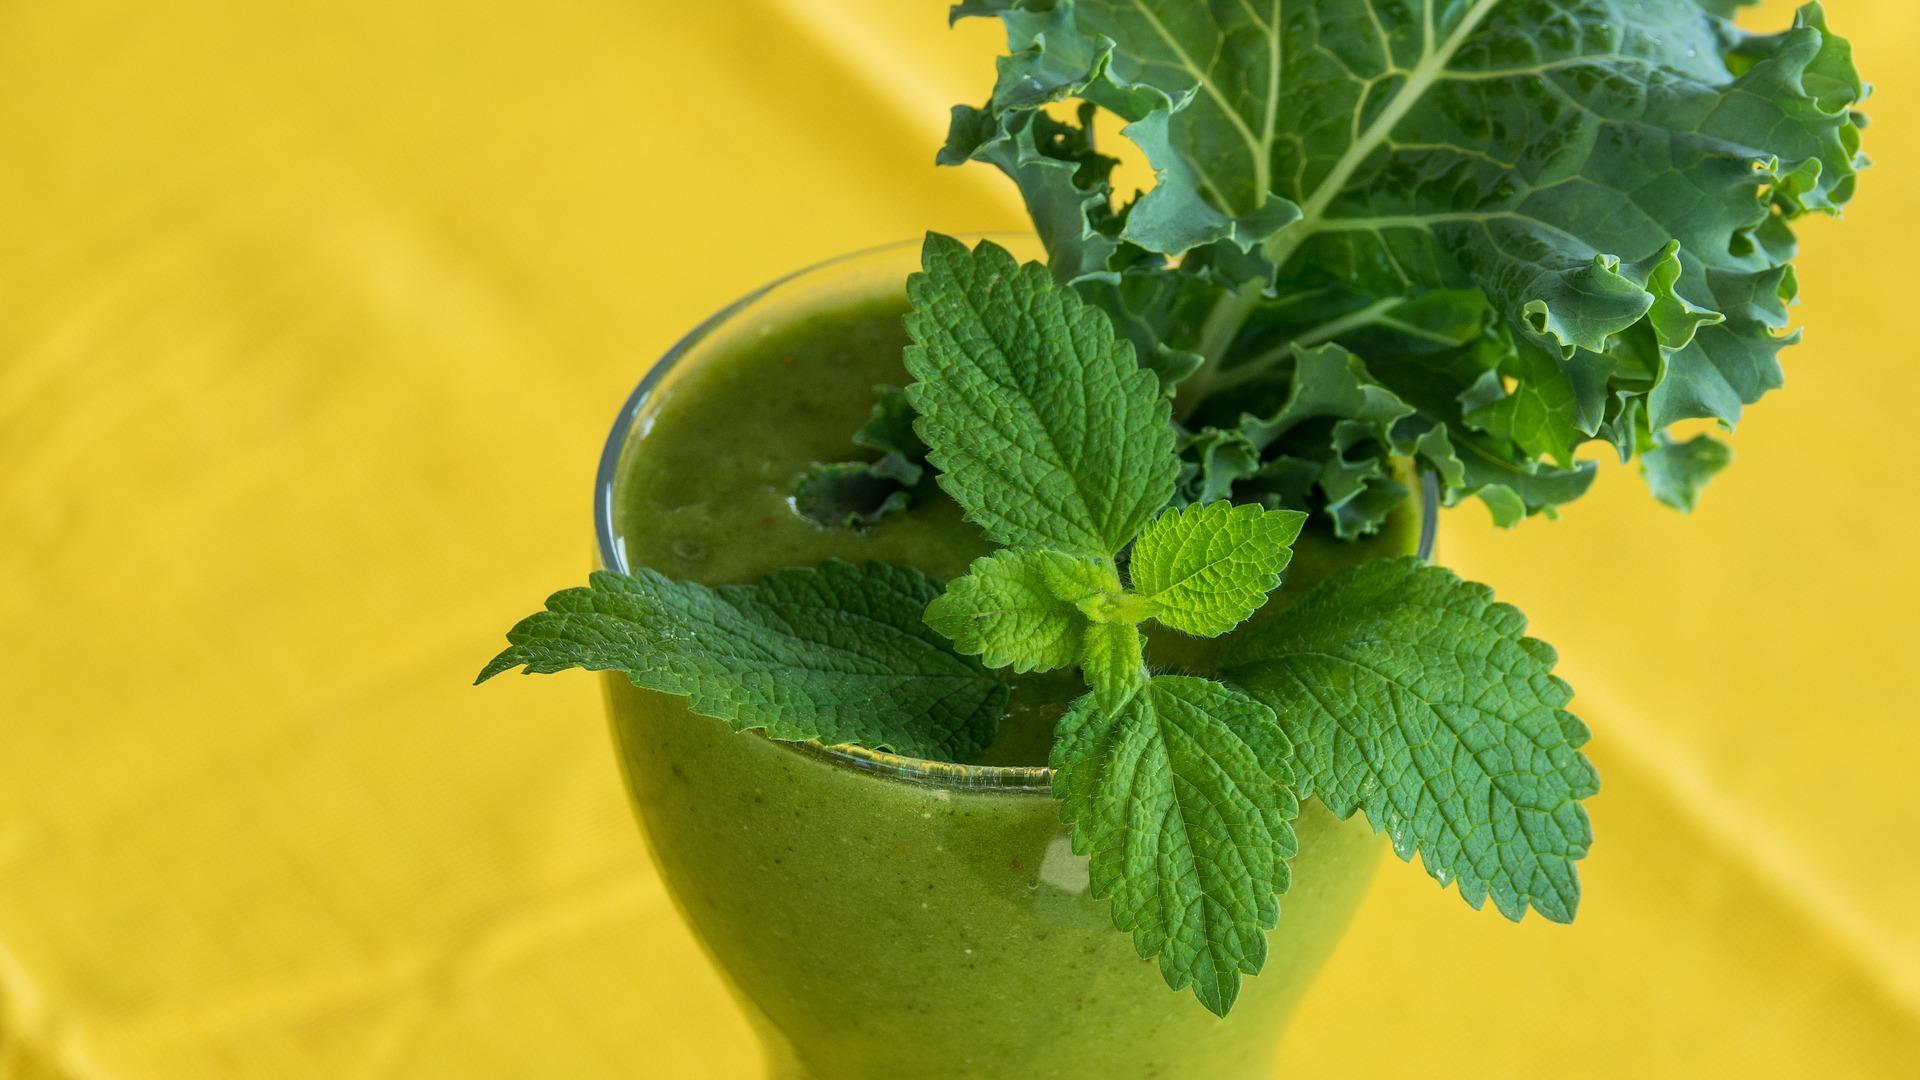 green-smoothie-2611410_1920.jpg